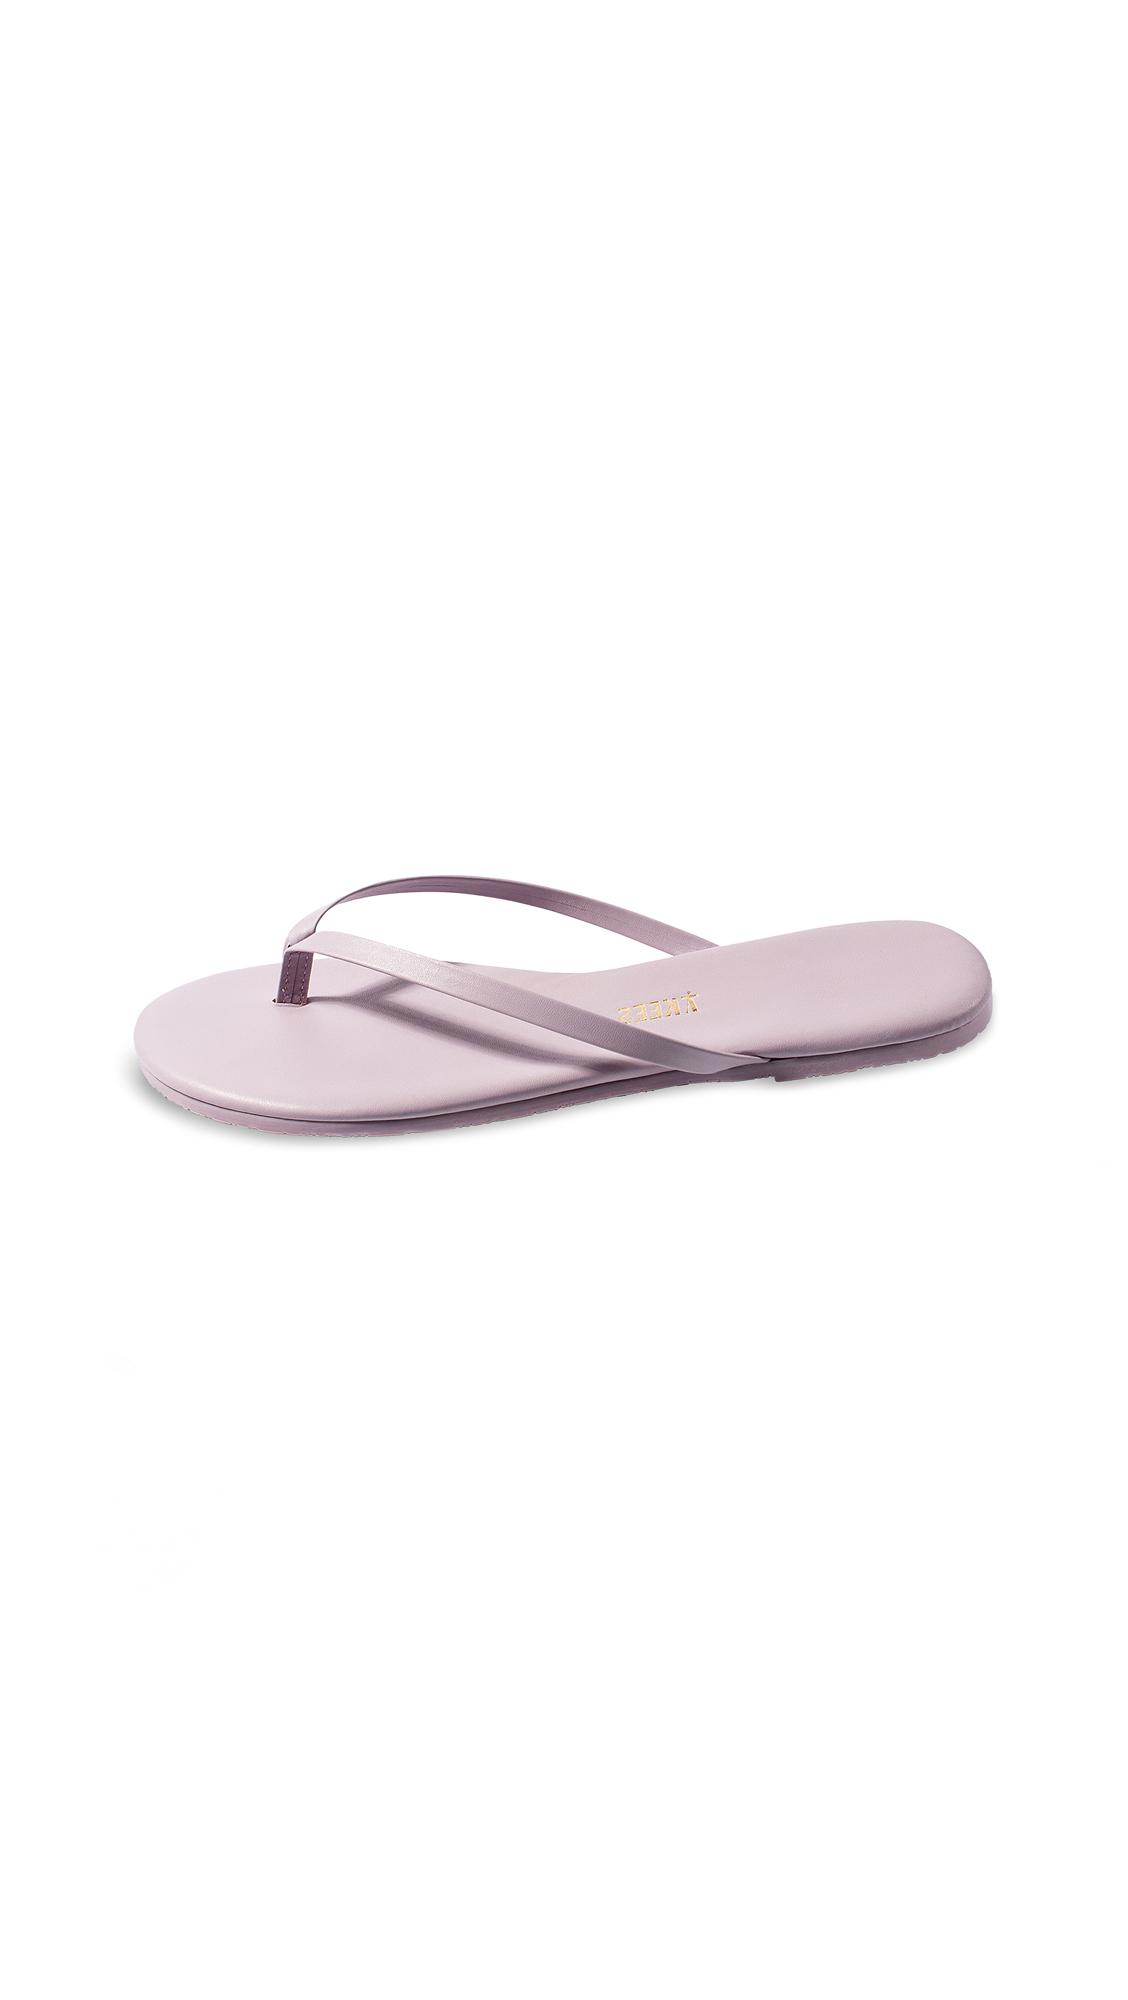 Buy TKEES Solid Flip Flops online, shop TKEES